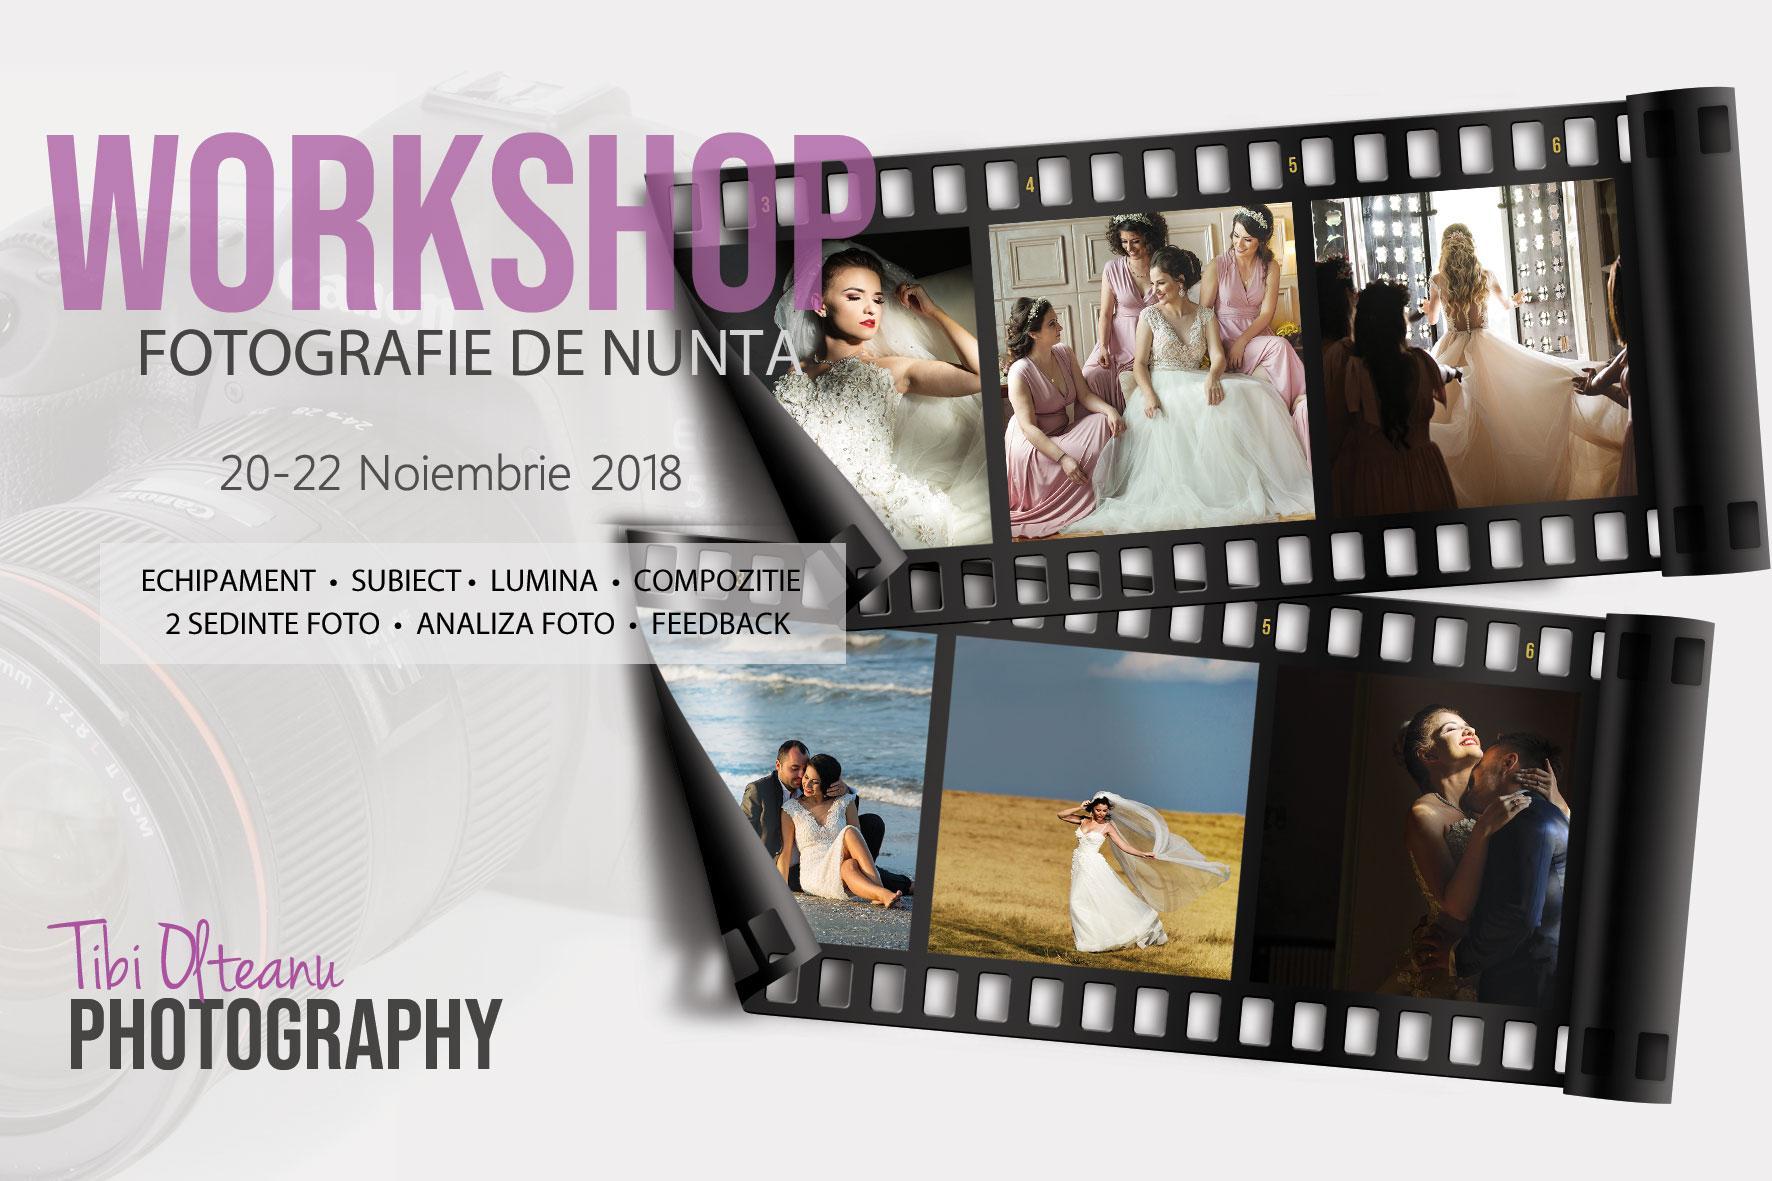 WORKSHOP fotografie de nunta